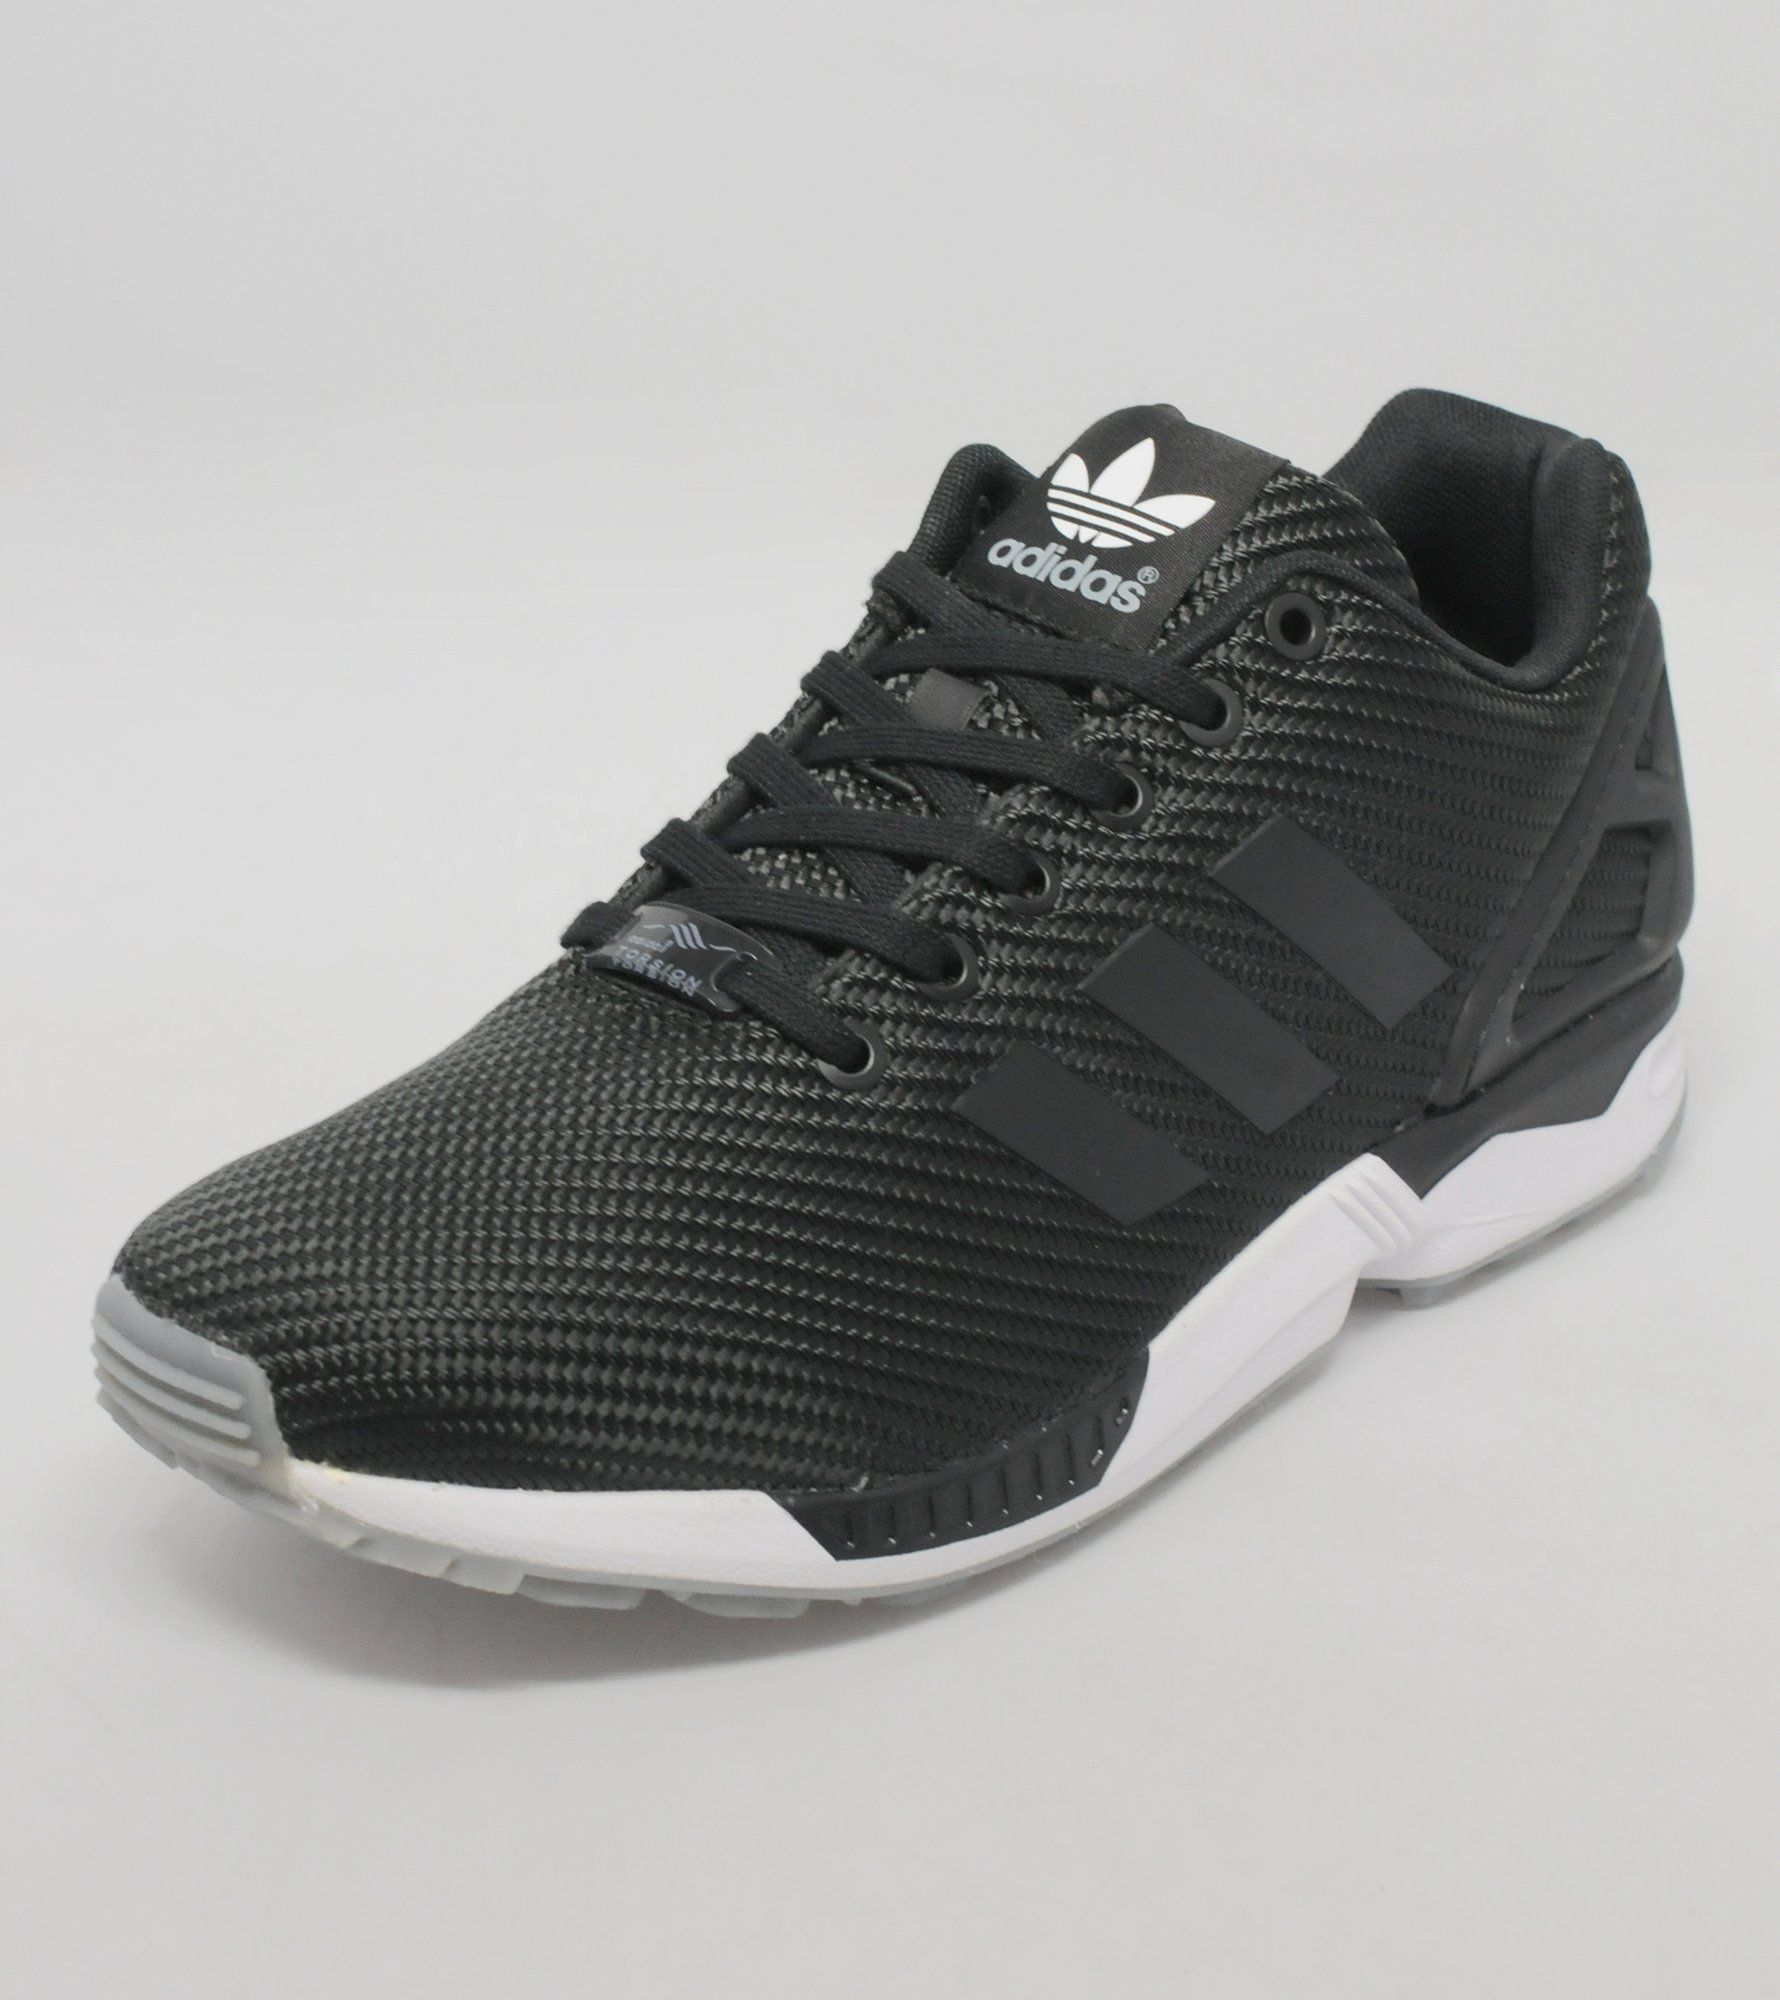 Adidas Originals ZX FLUX 'ballistic crestas Woven' tamaño 4f51c5 crestas 'ballistic 4d3ef8